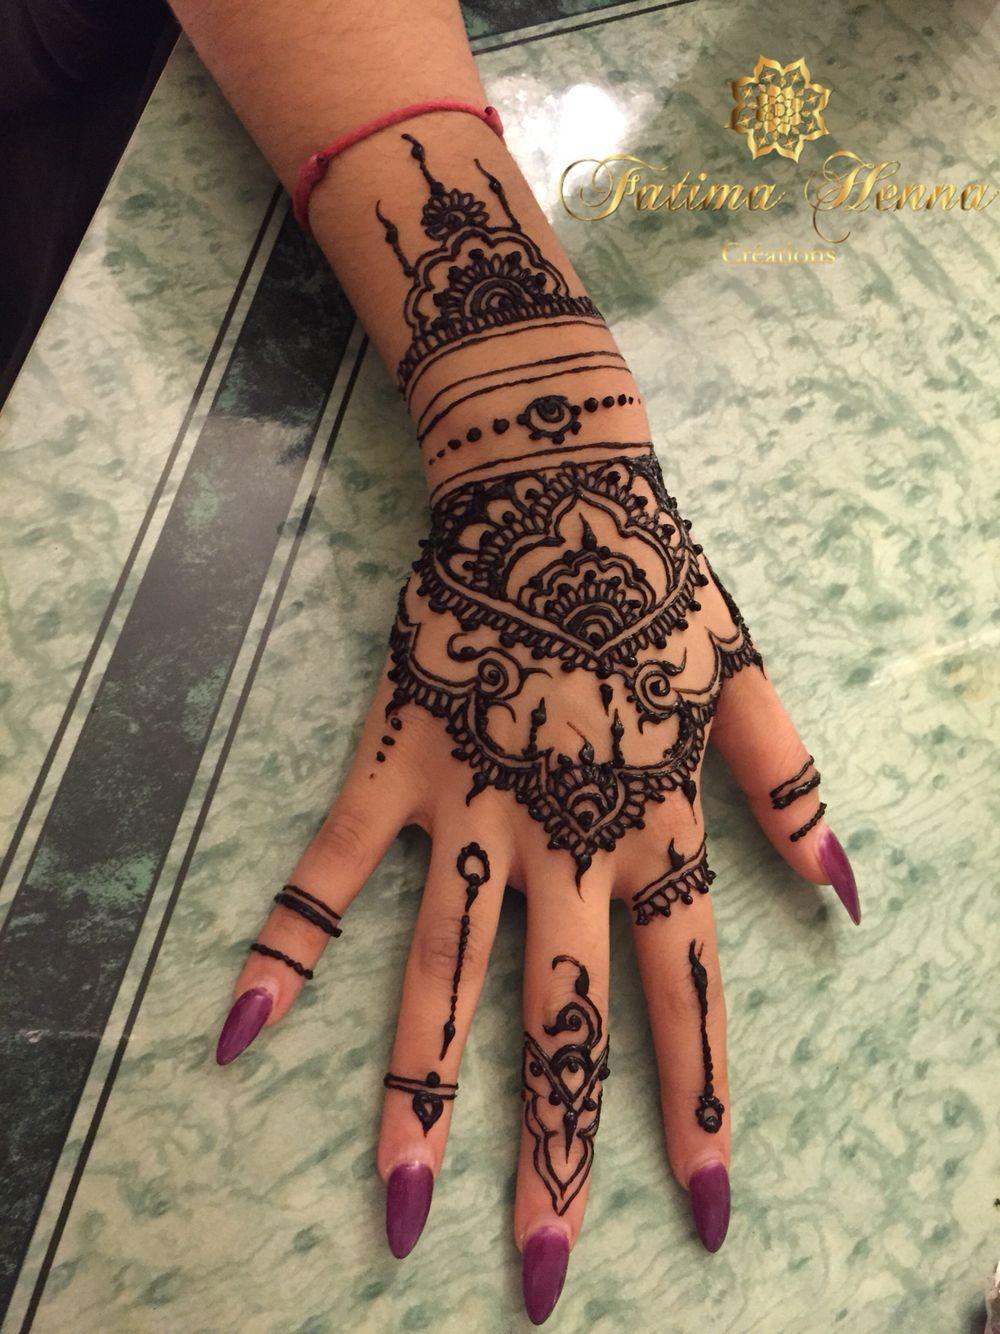 Inspiration Rihanna More Rhianna Tattoos Rihanna Hand Tattoo Henna Hand Tattoos